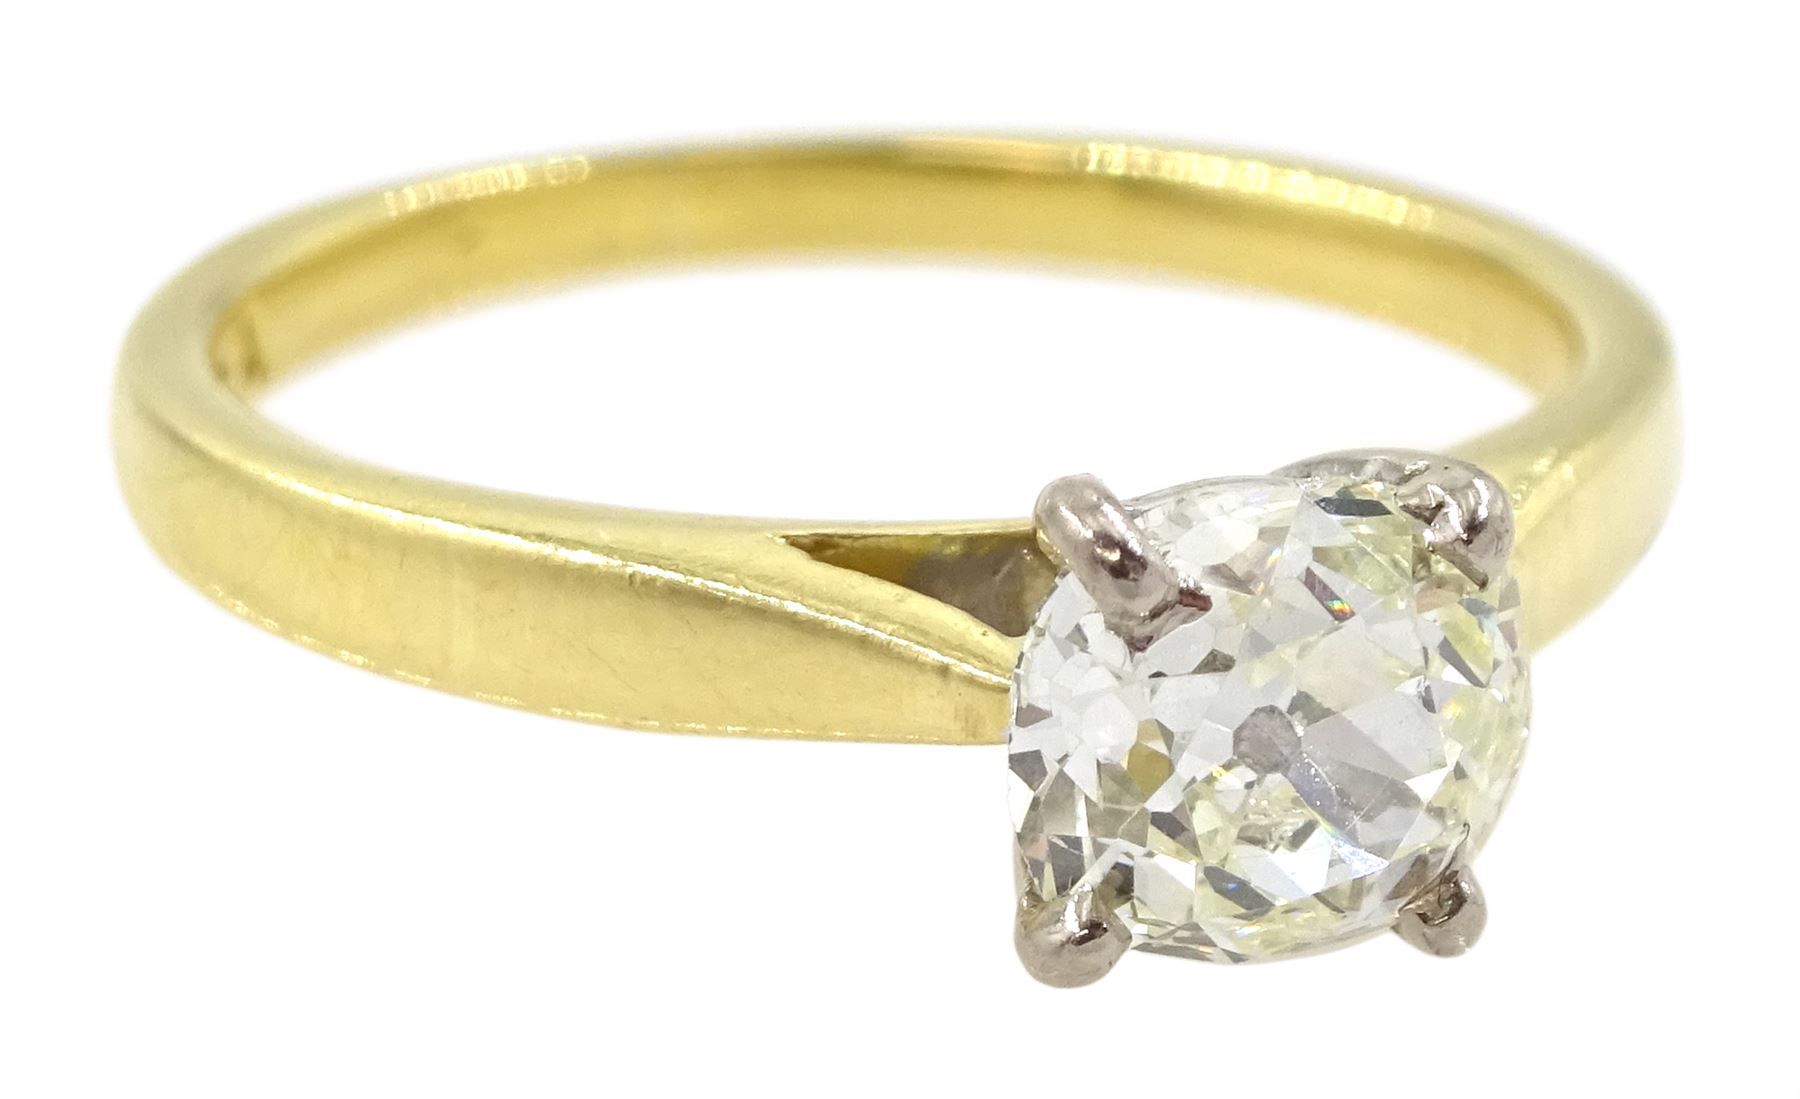 18ct gold single stone old cut diamond ring - Image 3 of 4